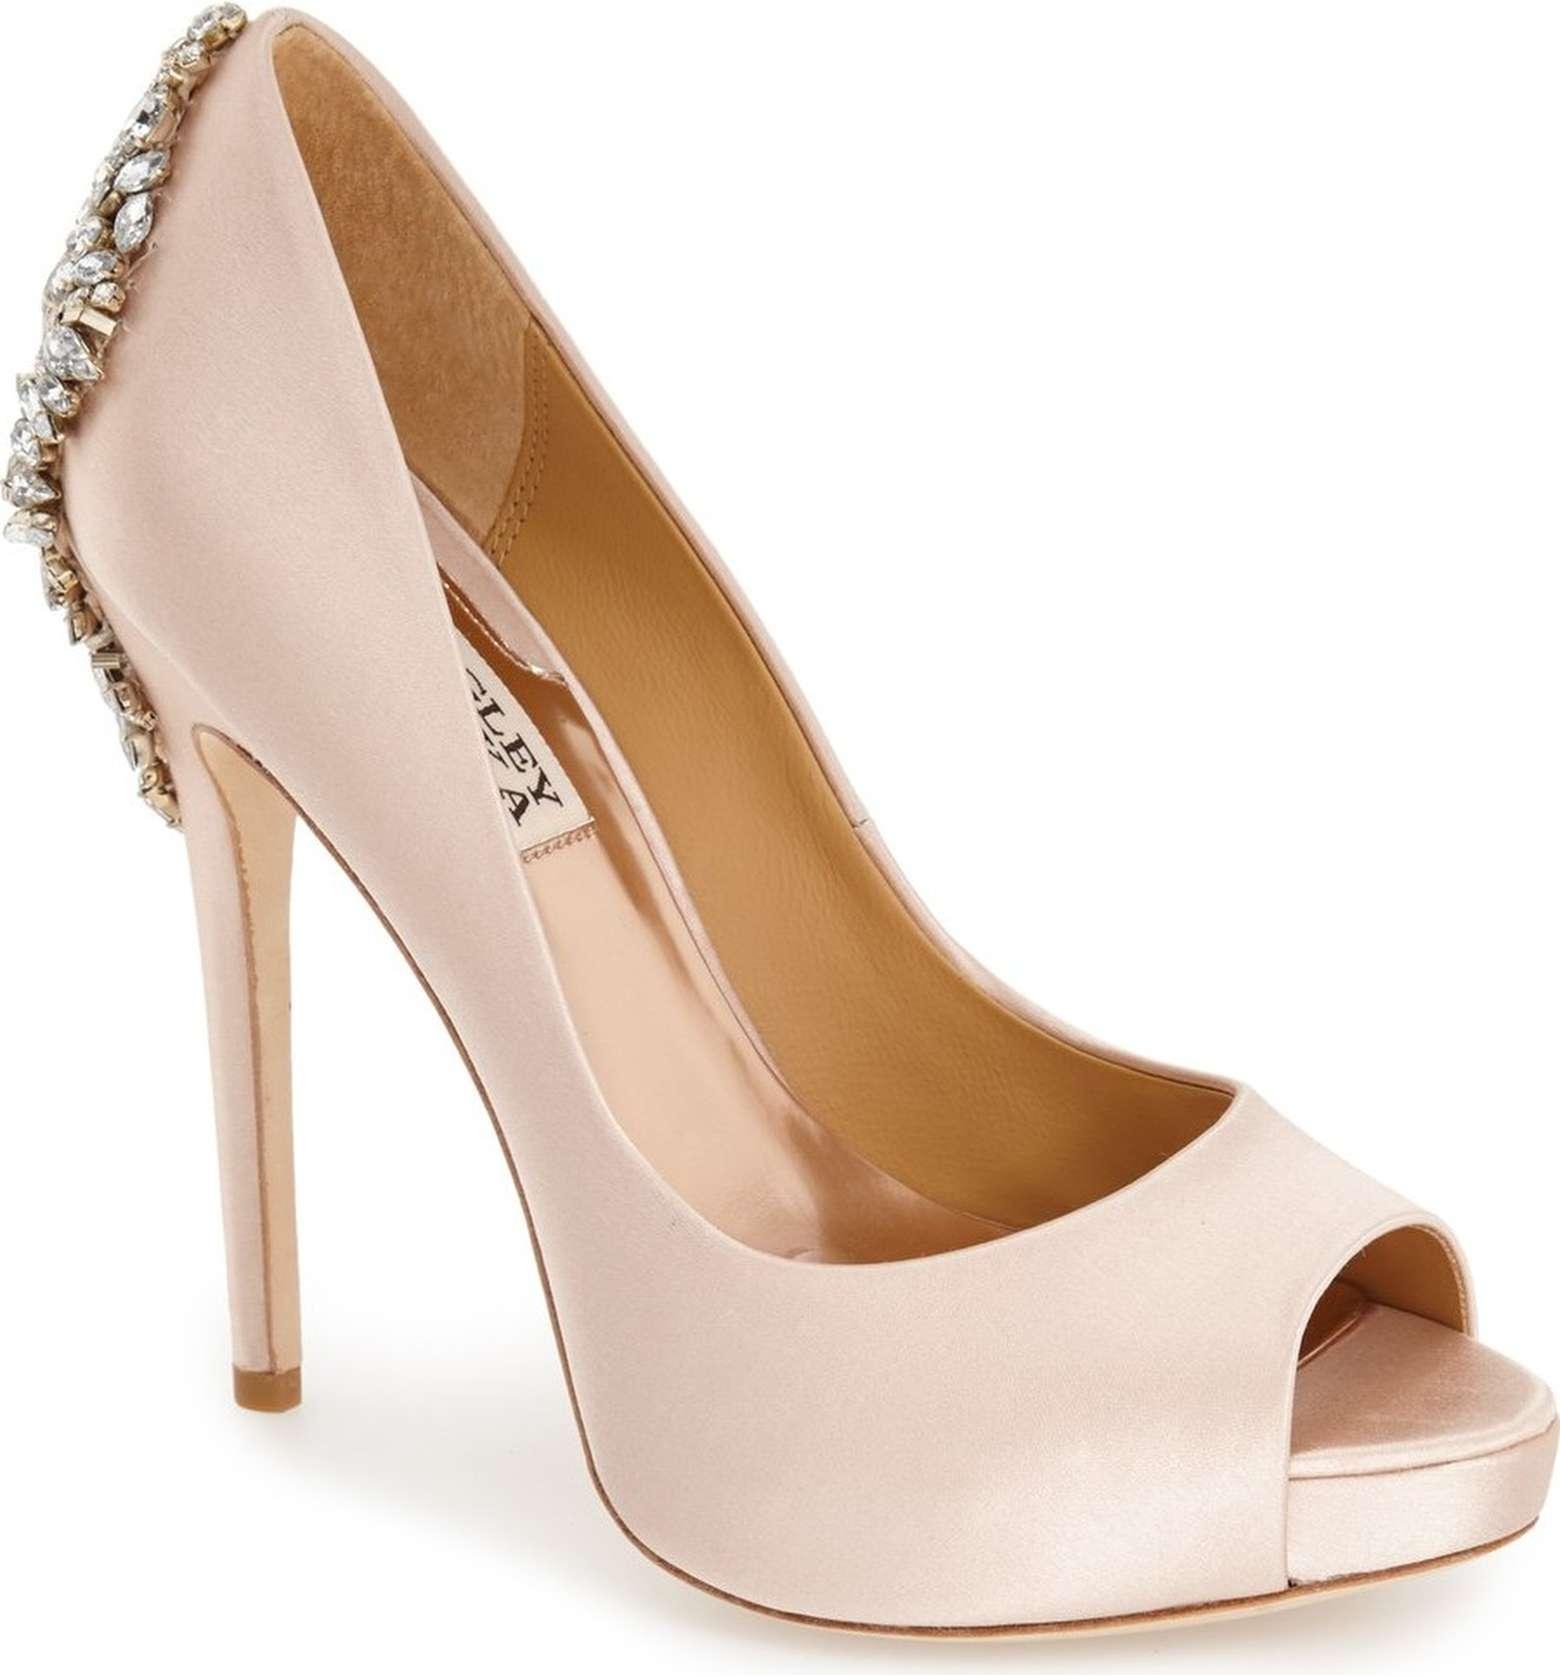 badgley mischka heel.jpg